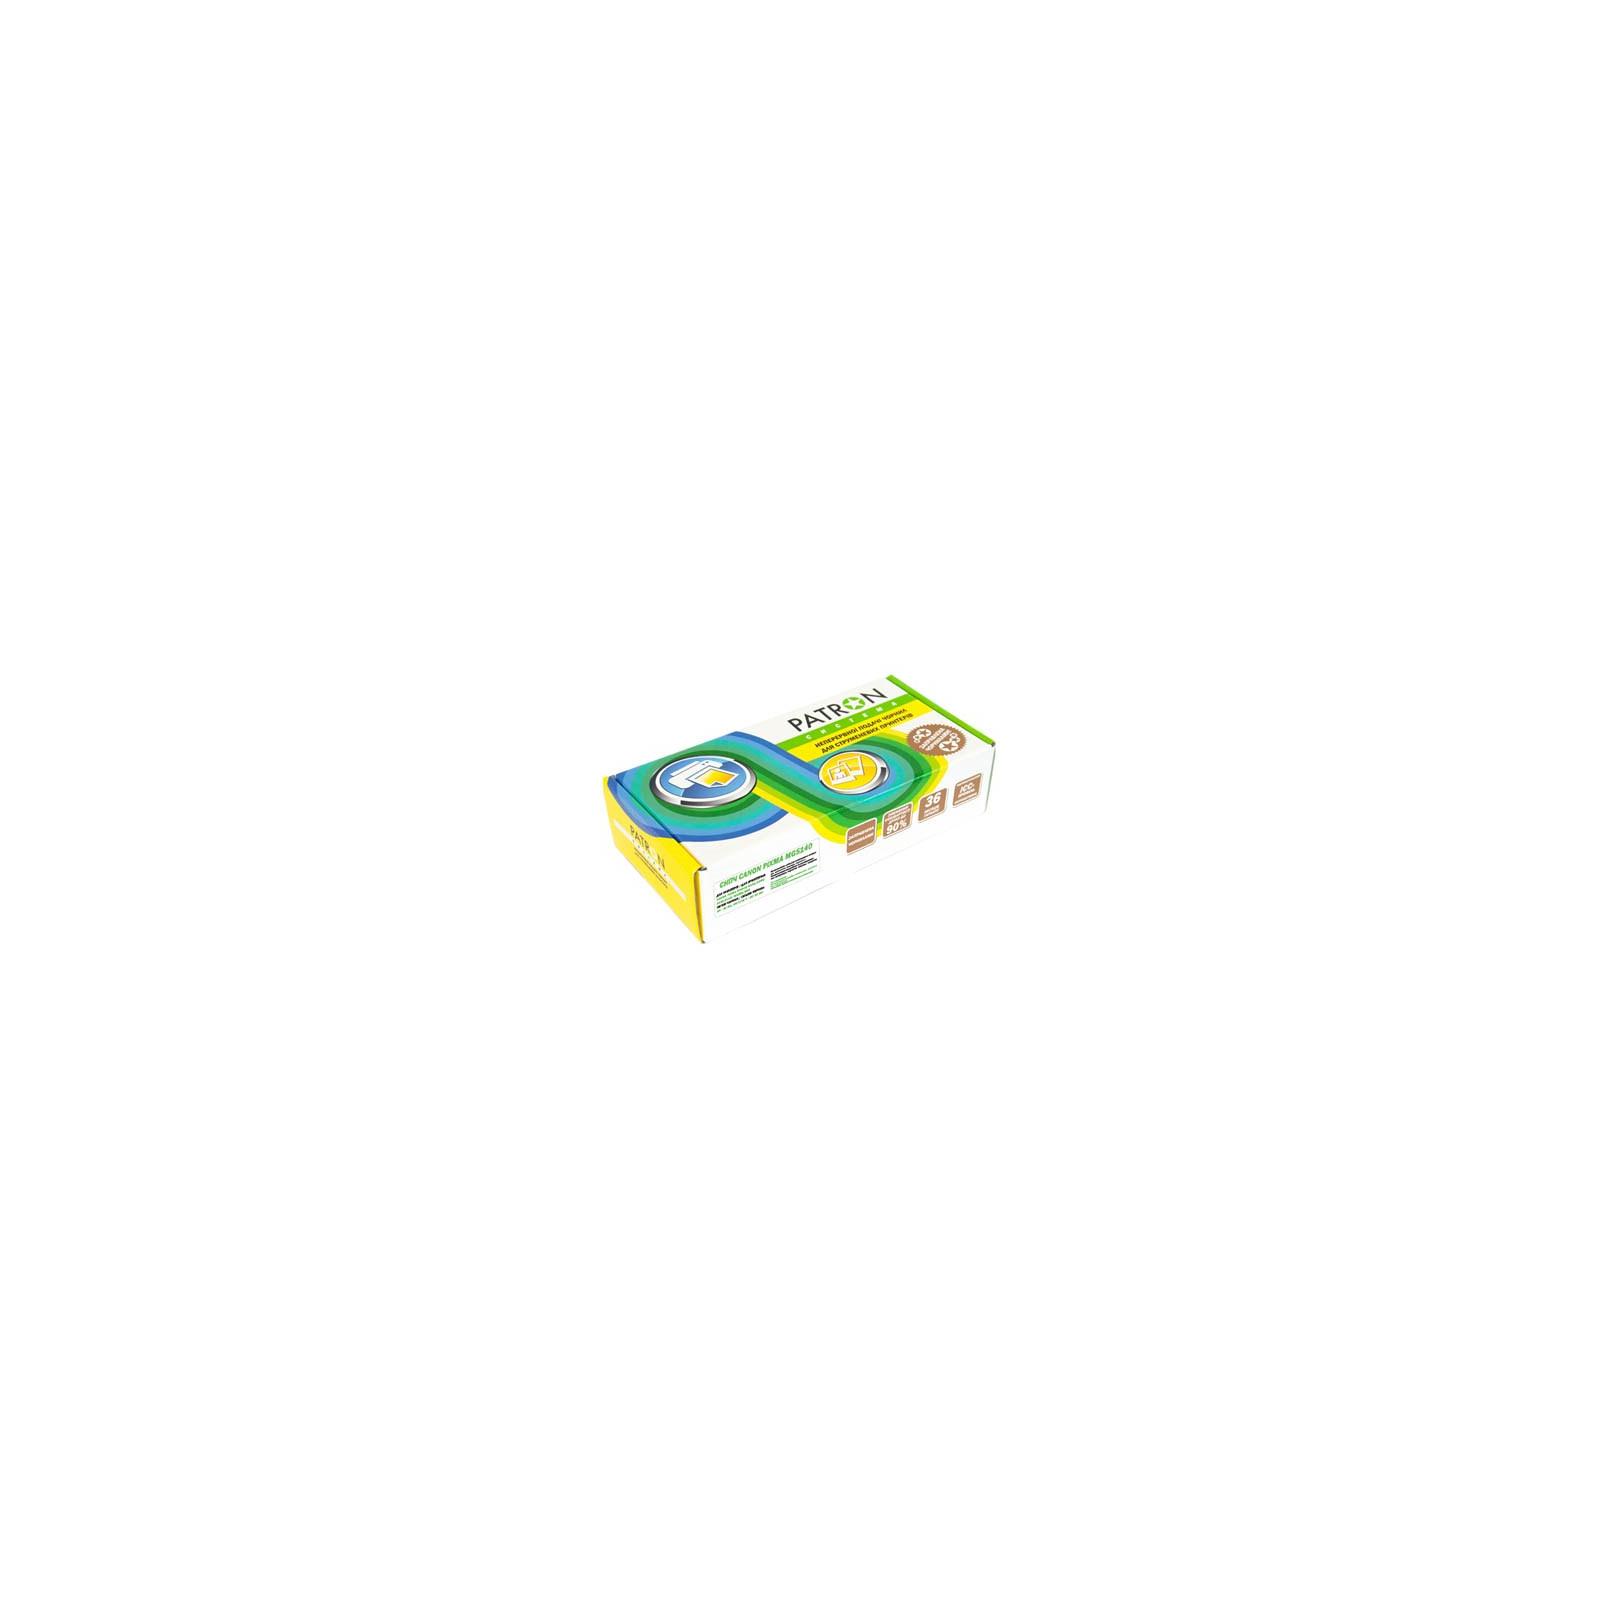 СНПЧ PATRON CANON MG5140/5240/iP4840/MX880/884 (CISS-PN-C-CAN-MG5140)